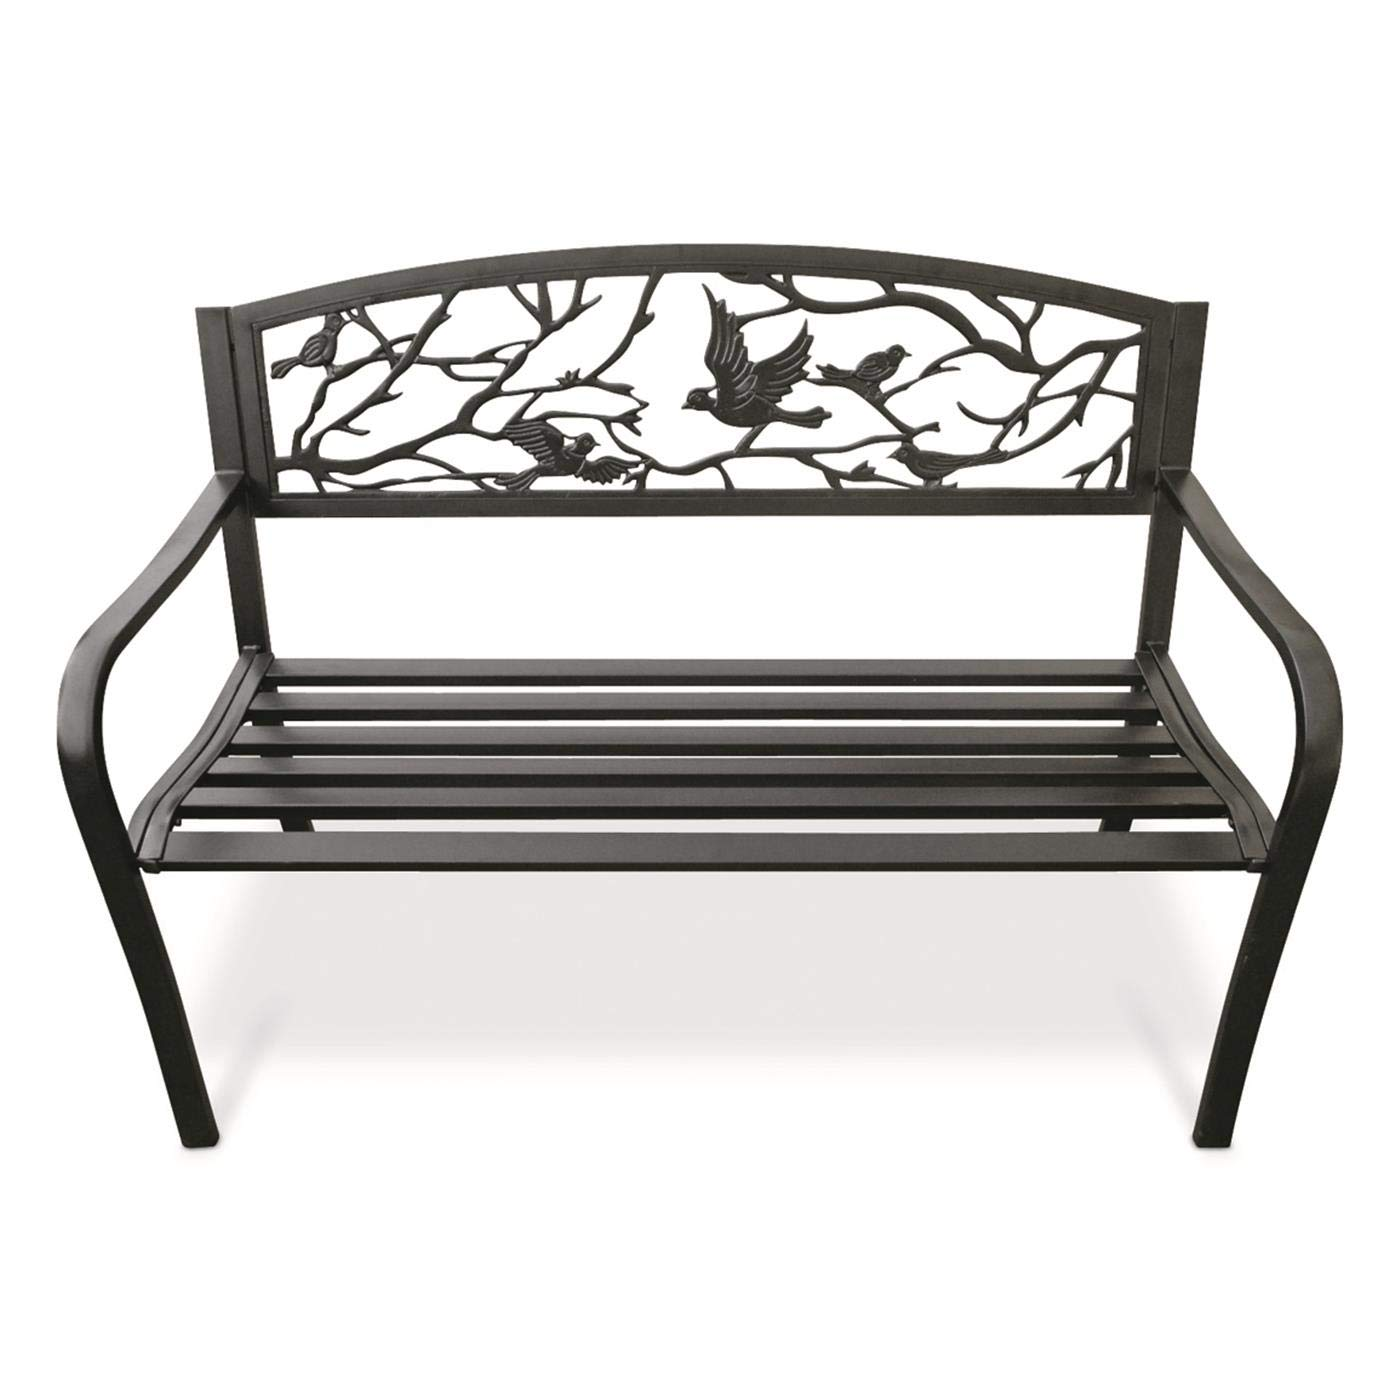 Wondrous Castlecreek Perched Birds Park Bench Ibusinesslaw Wood Chair Design Ideas Ibusinesslaworg